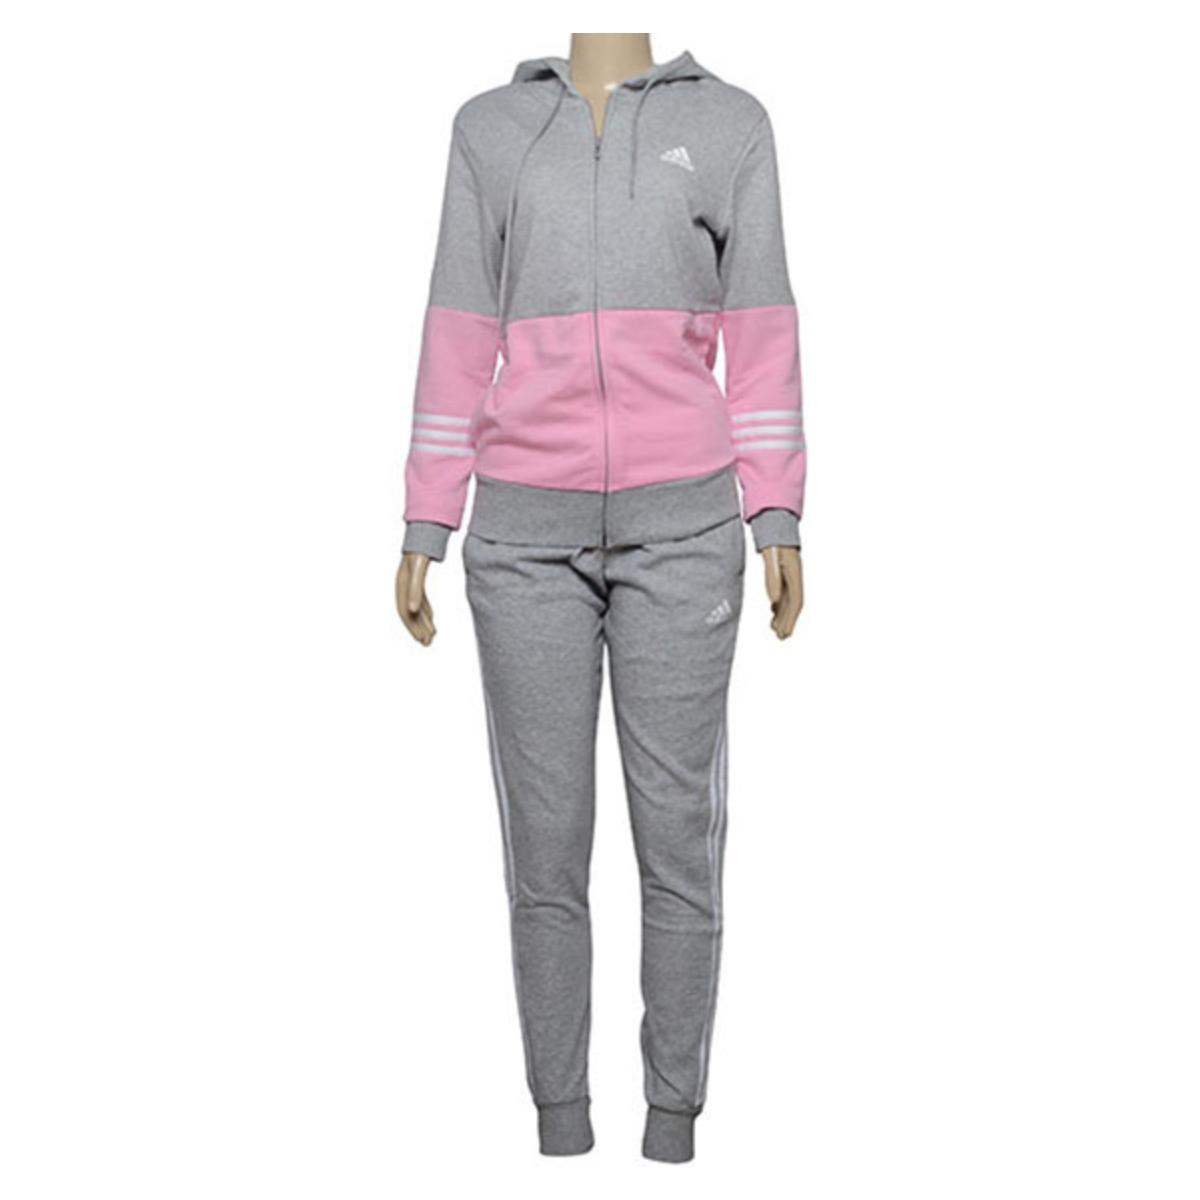 Abrigo Feminino Adidas Dx0765 Wts co Energize Cinza/rosa